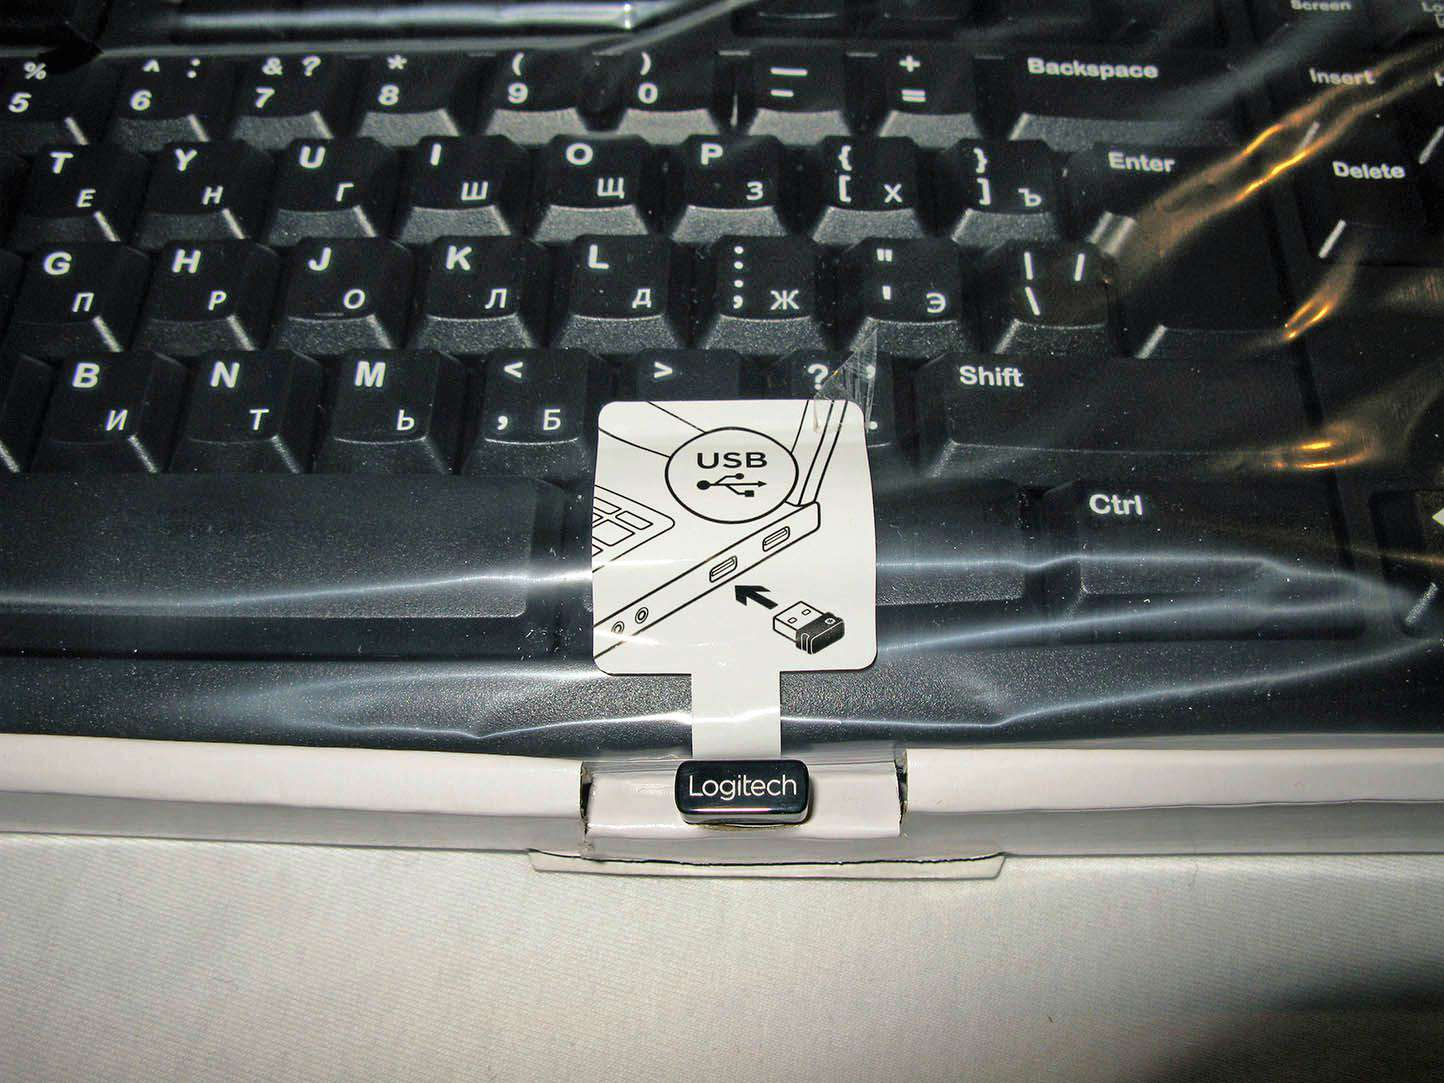 (920-003757) Клавиатура Беспроводная Logitech Wireless Keyboard K270